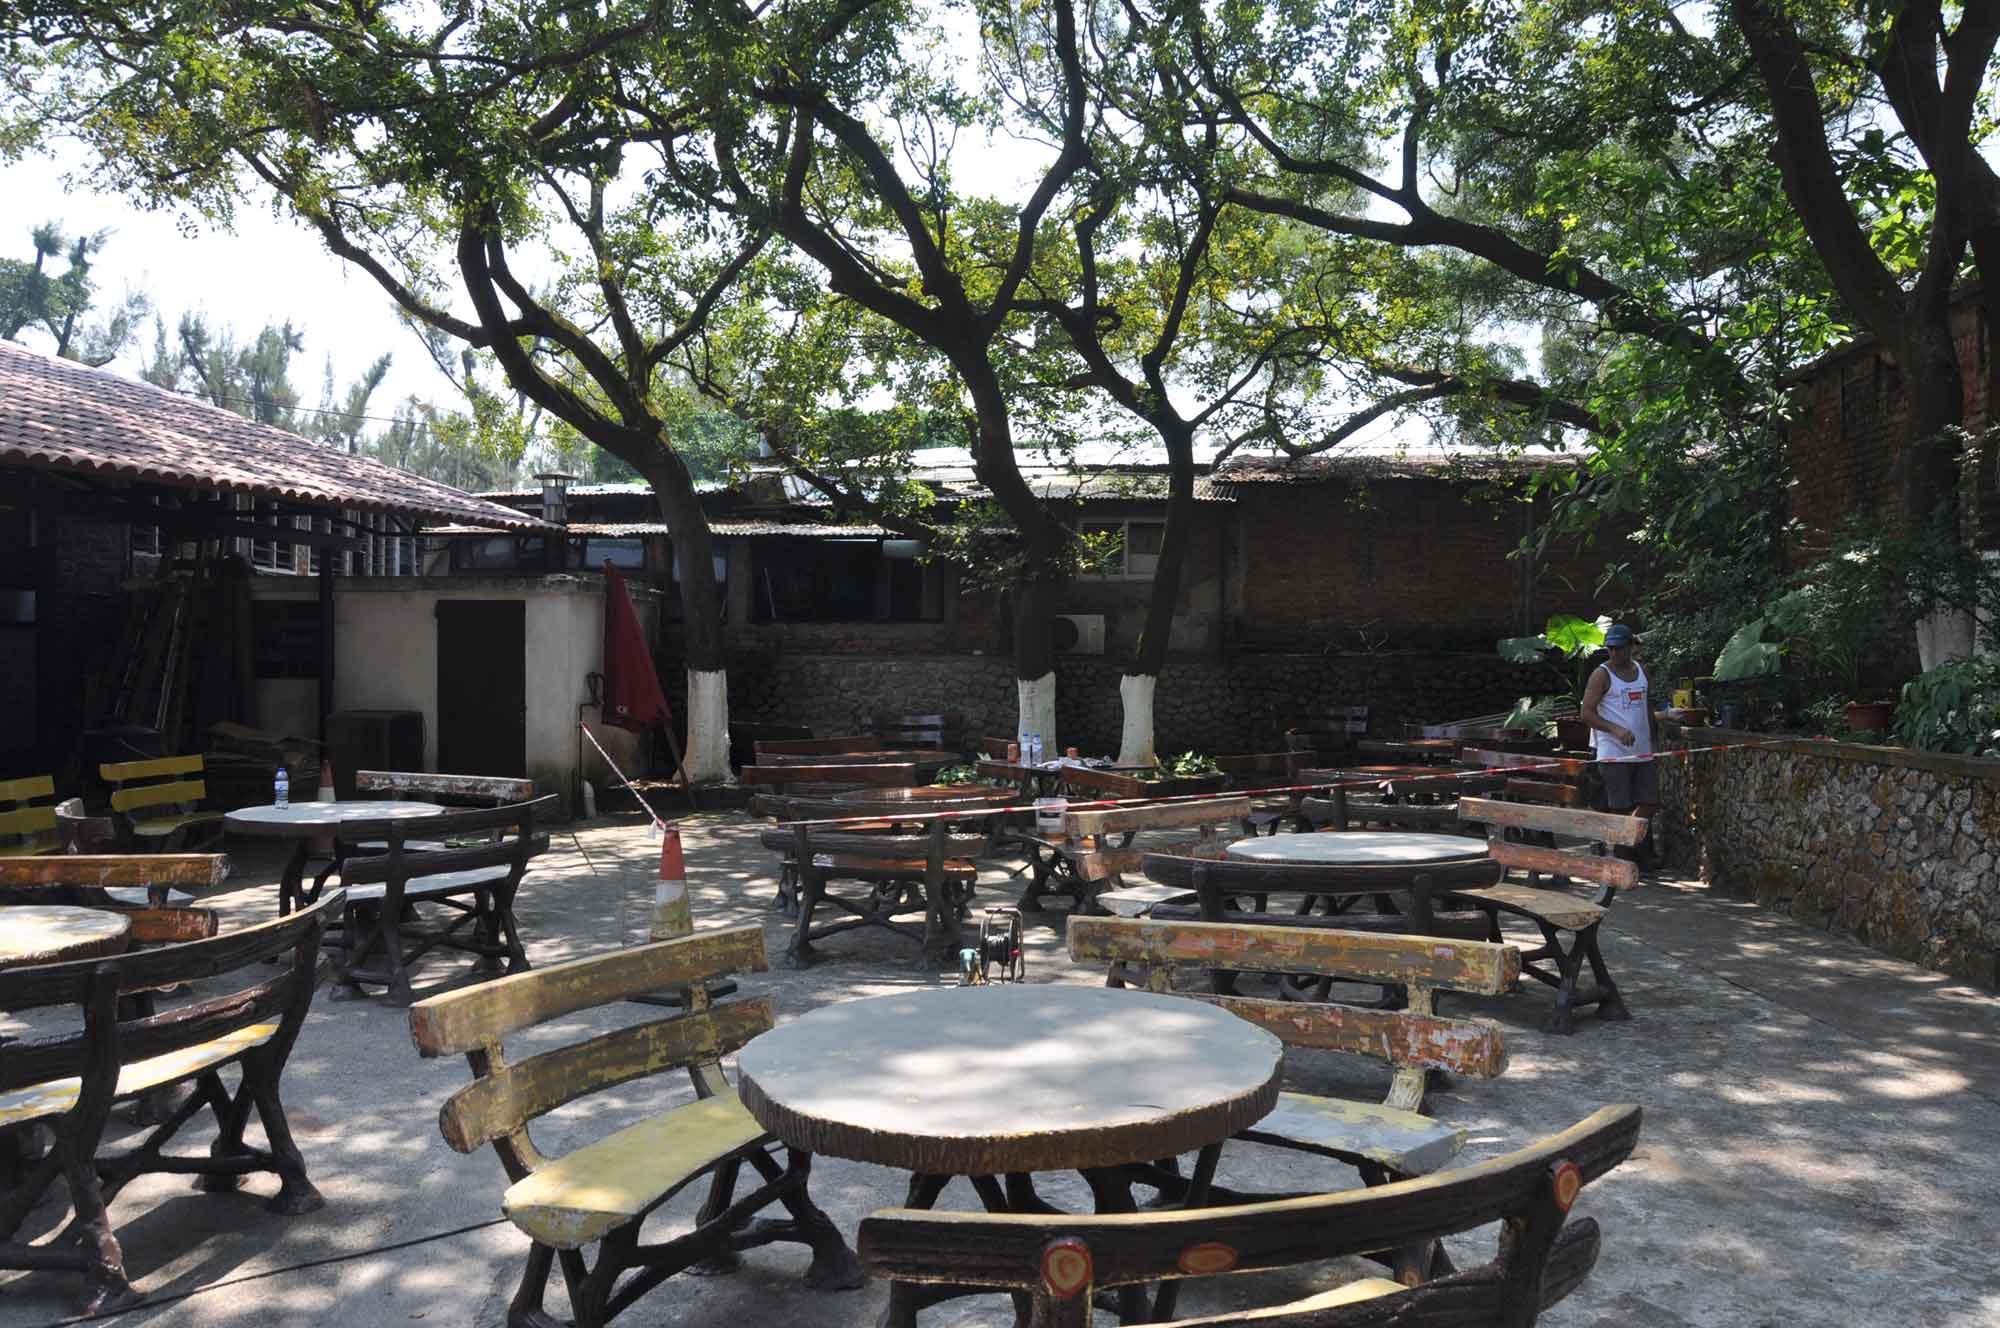 Fernando Macau outdoor seating